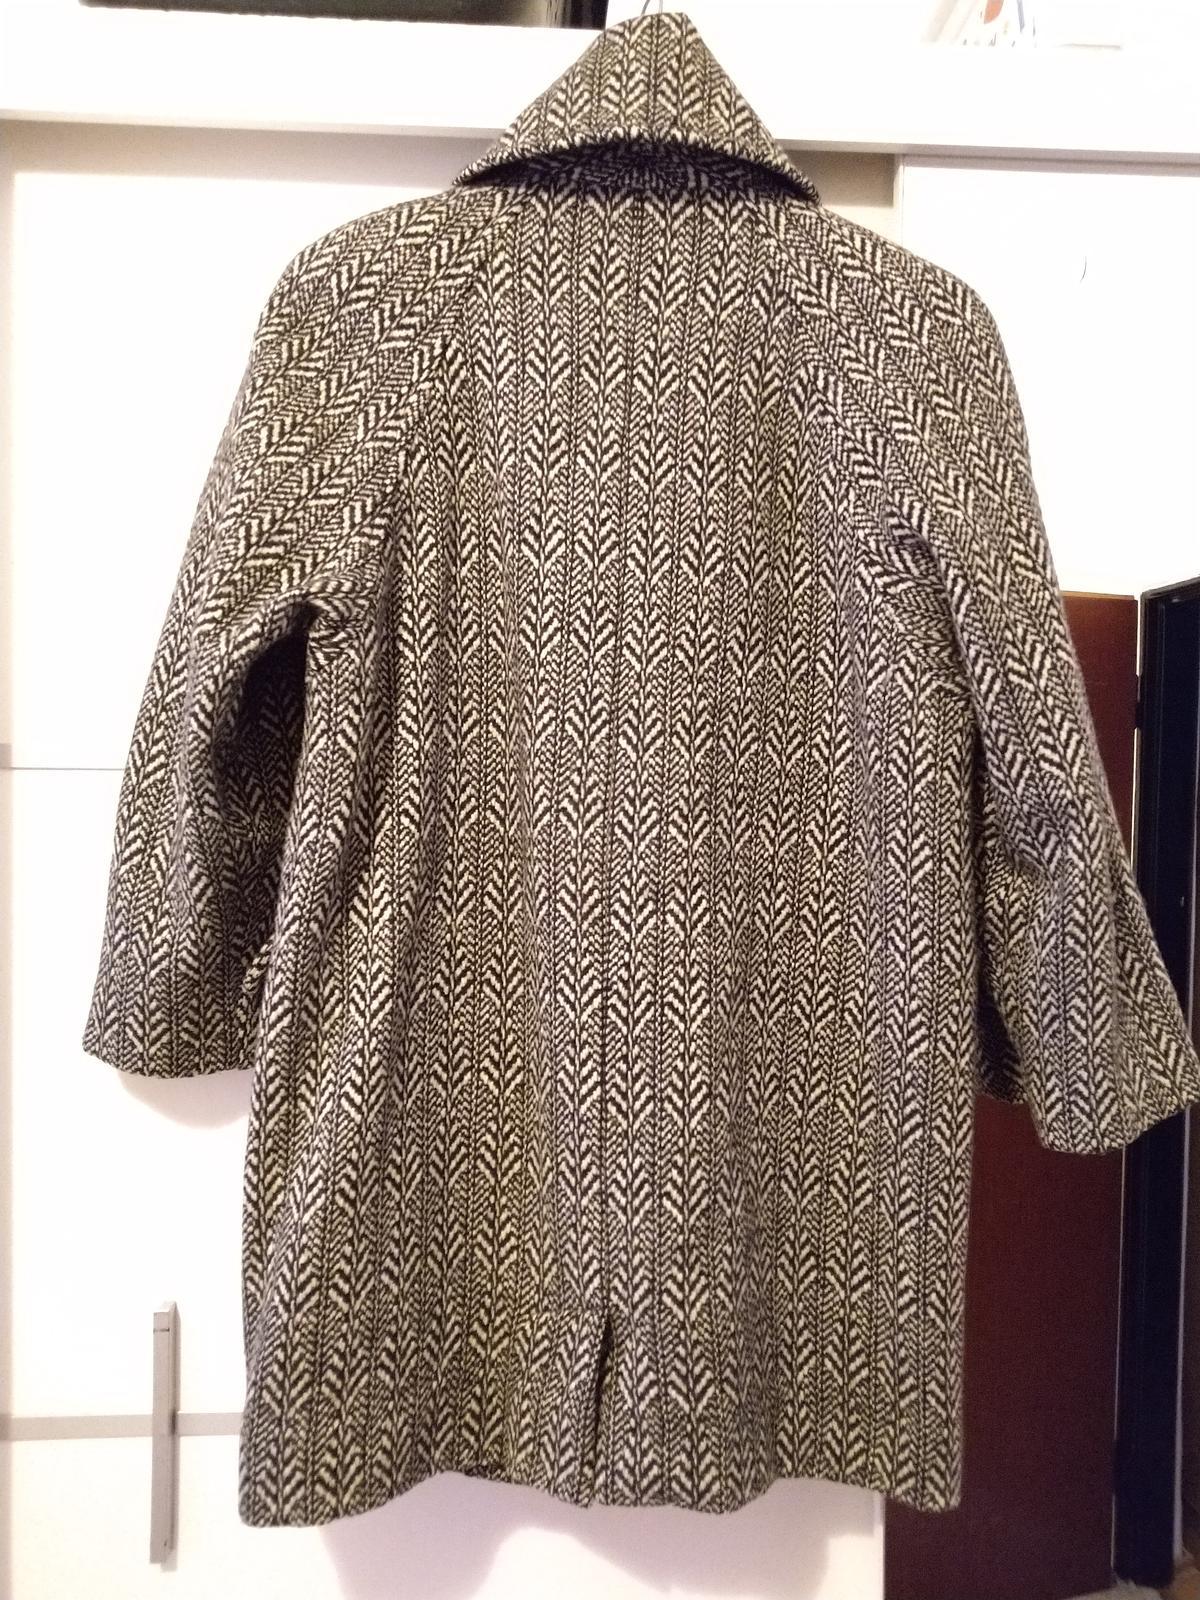 Čiernobiely kabát c.50 - Obrázok č. 2